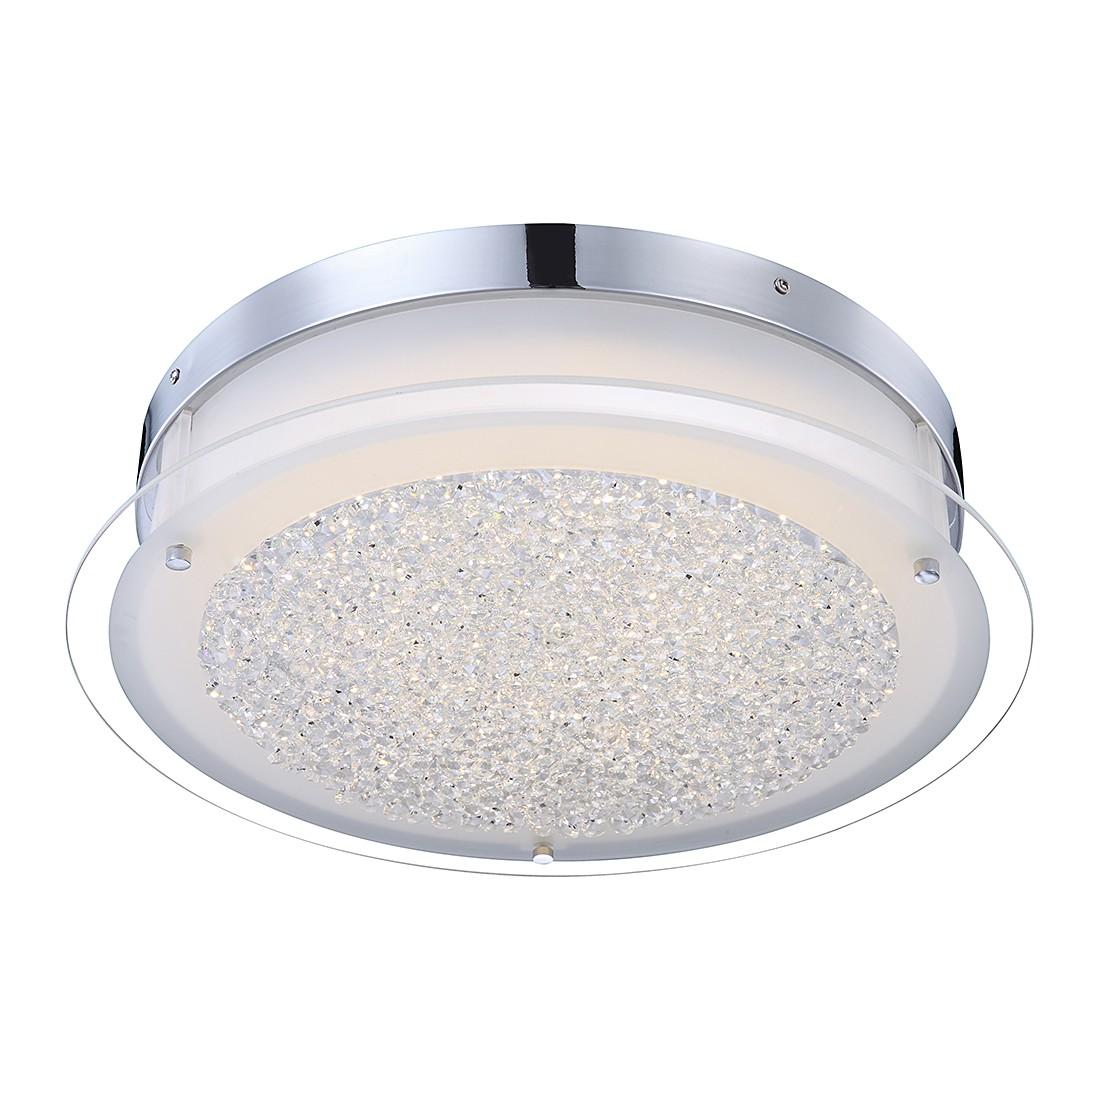 Deckenleuchte Leah I 3 ● Metall ● Silber ● 1-flammig- Lux